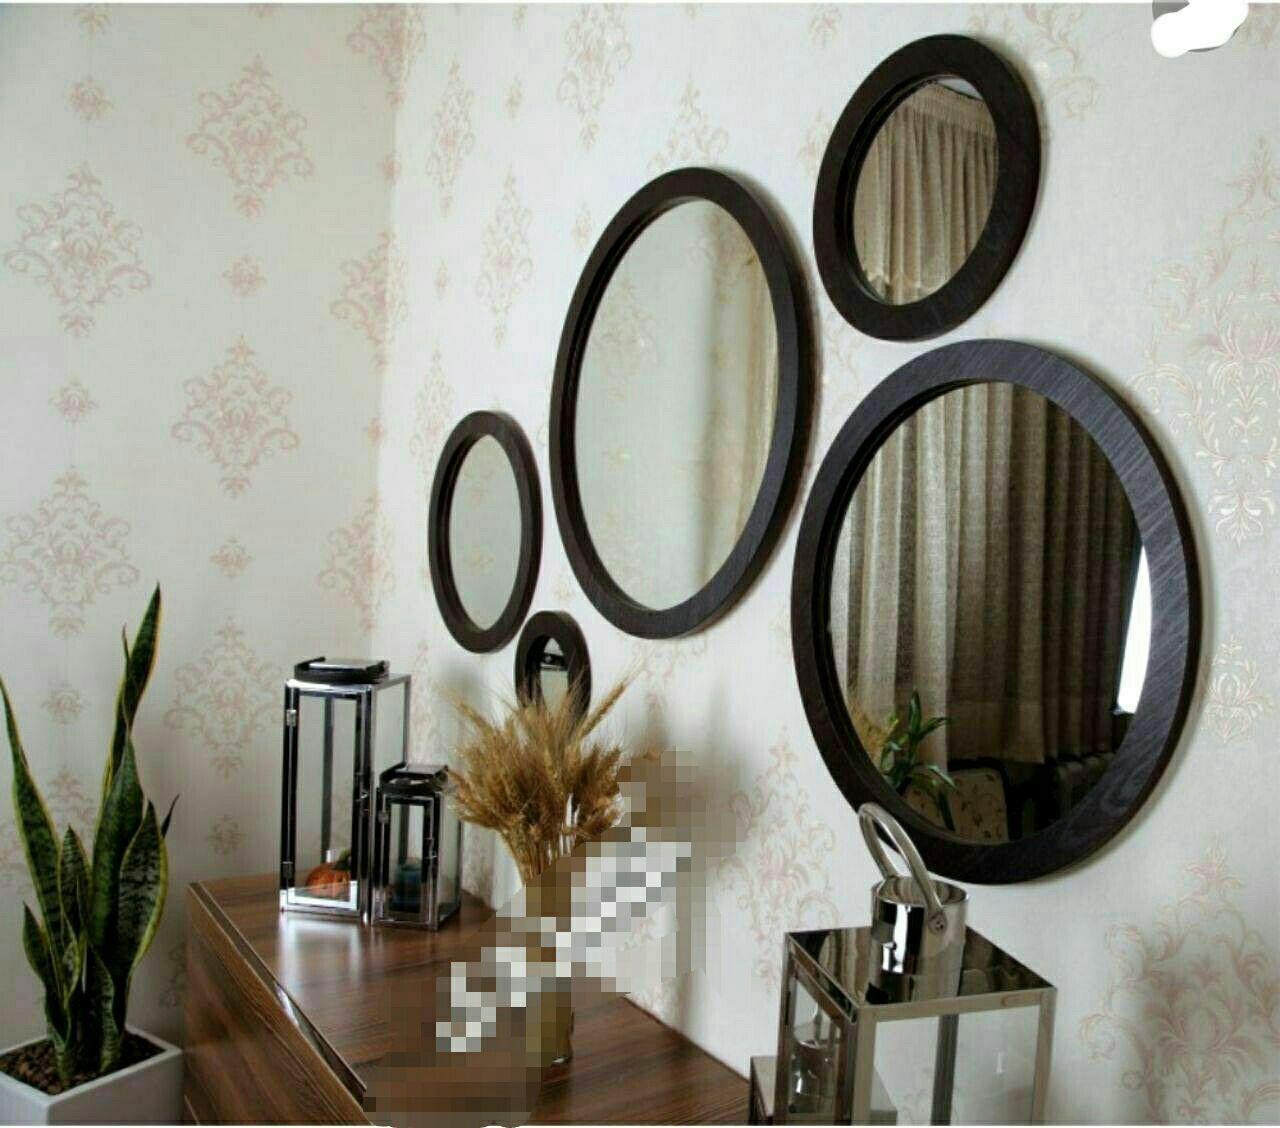 قیمت کد ۷-۱۰۹ آینه دکوراتیو ۵ تیکه